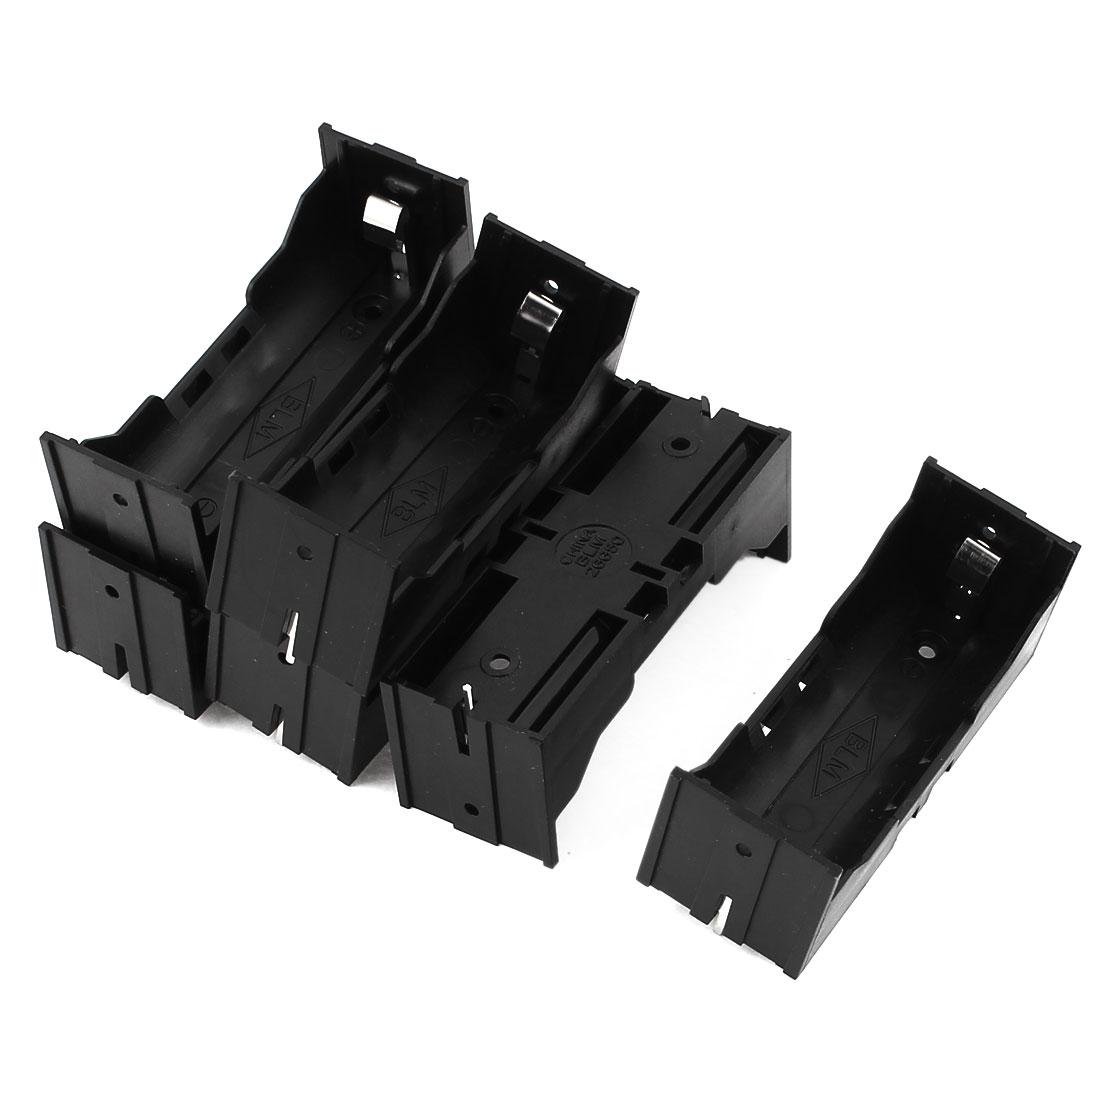 6Pcs Plastic Single 26650 Battery Holder Case Storage Box Black